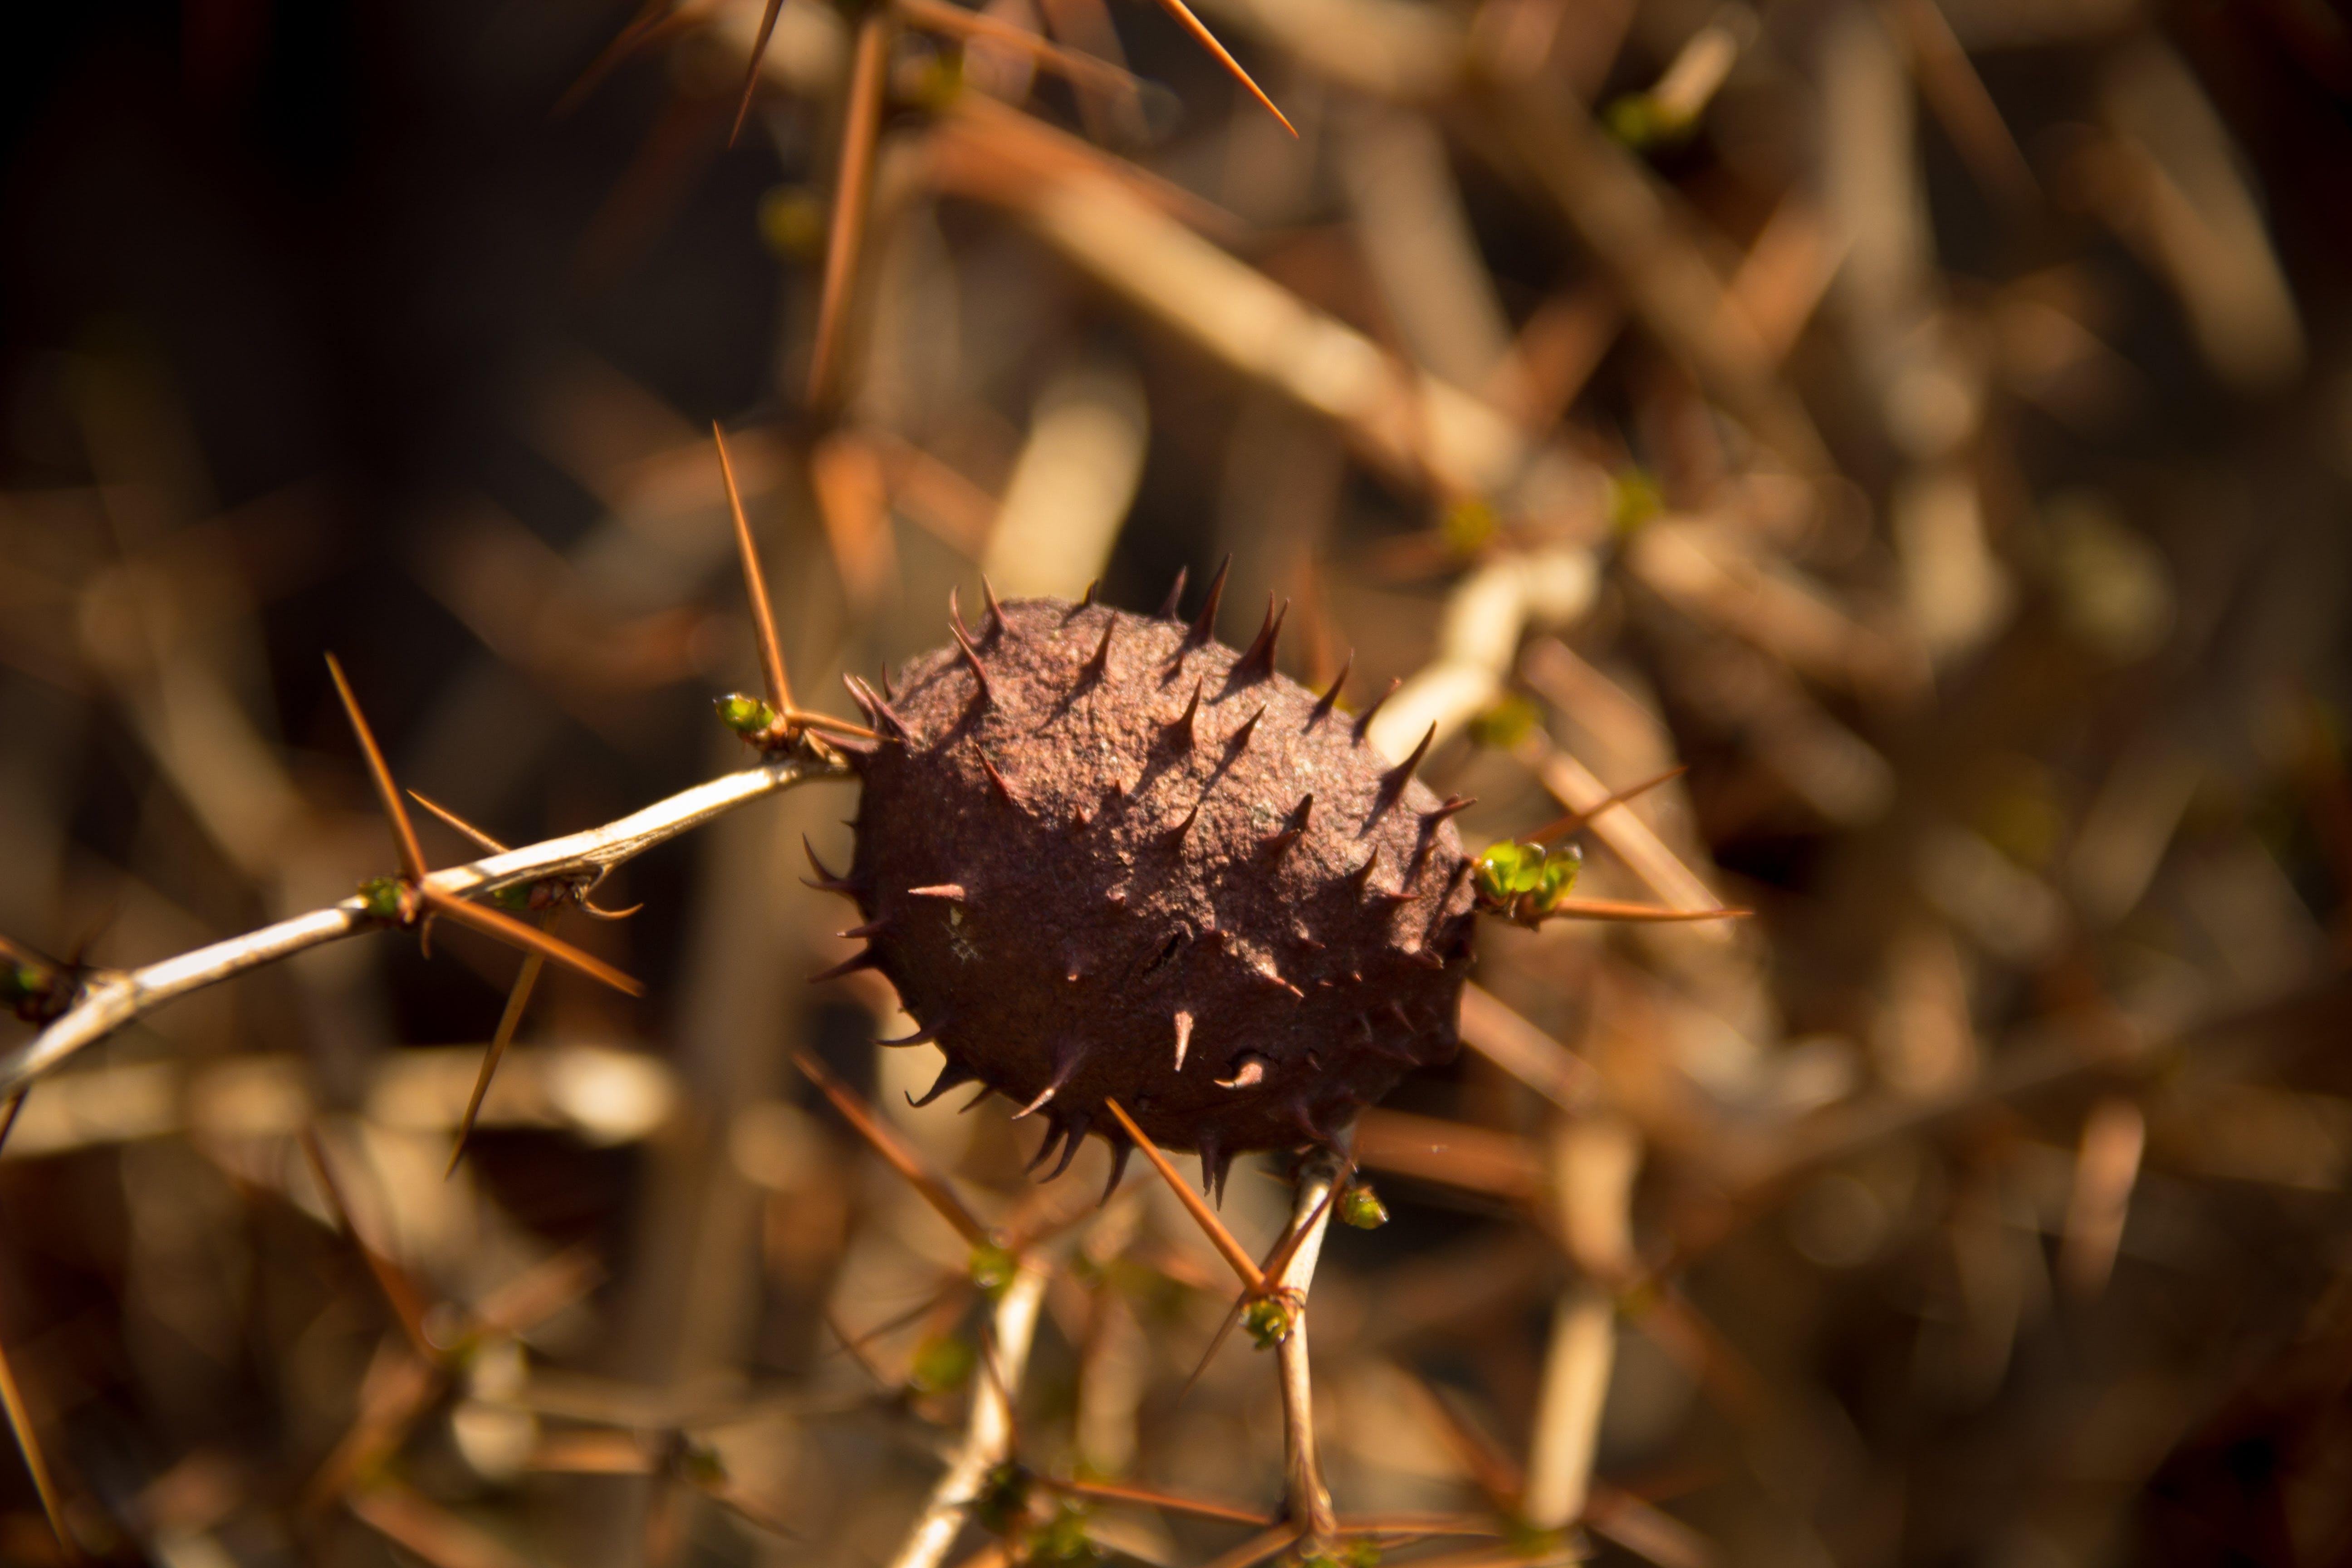 Free stock photo of nature, shell, needle, nut